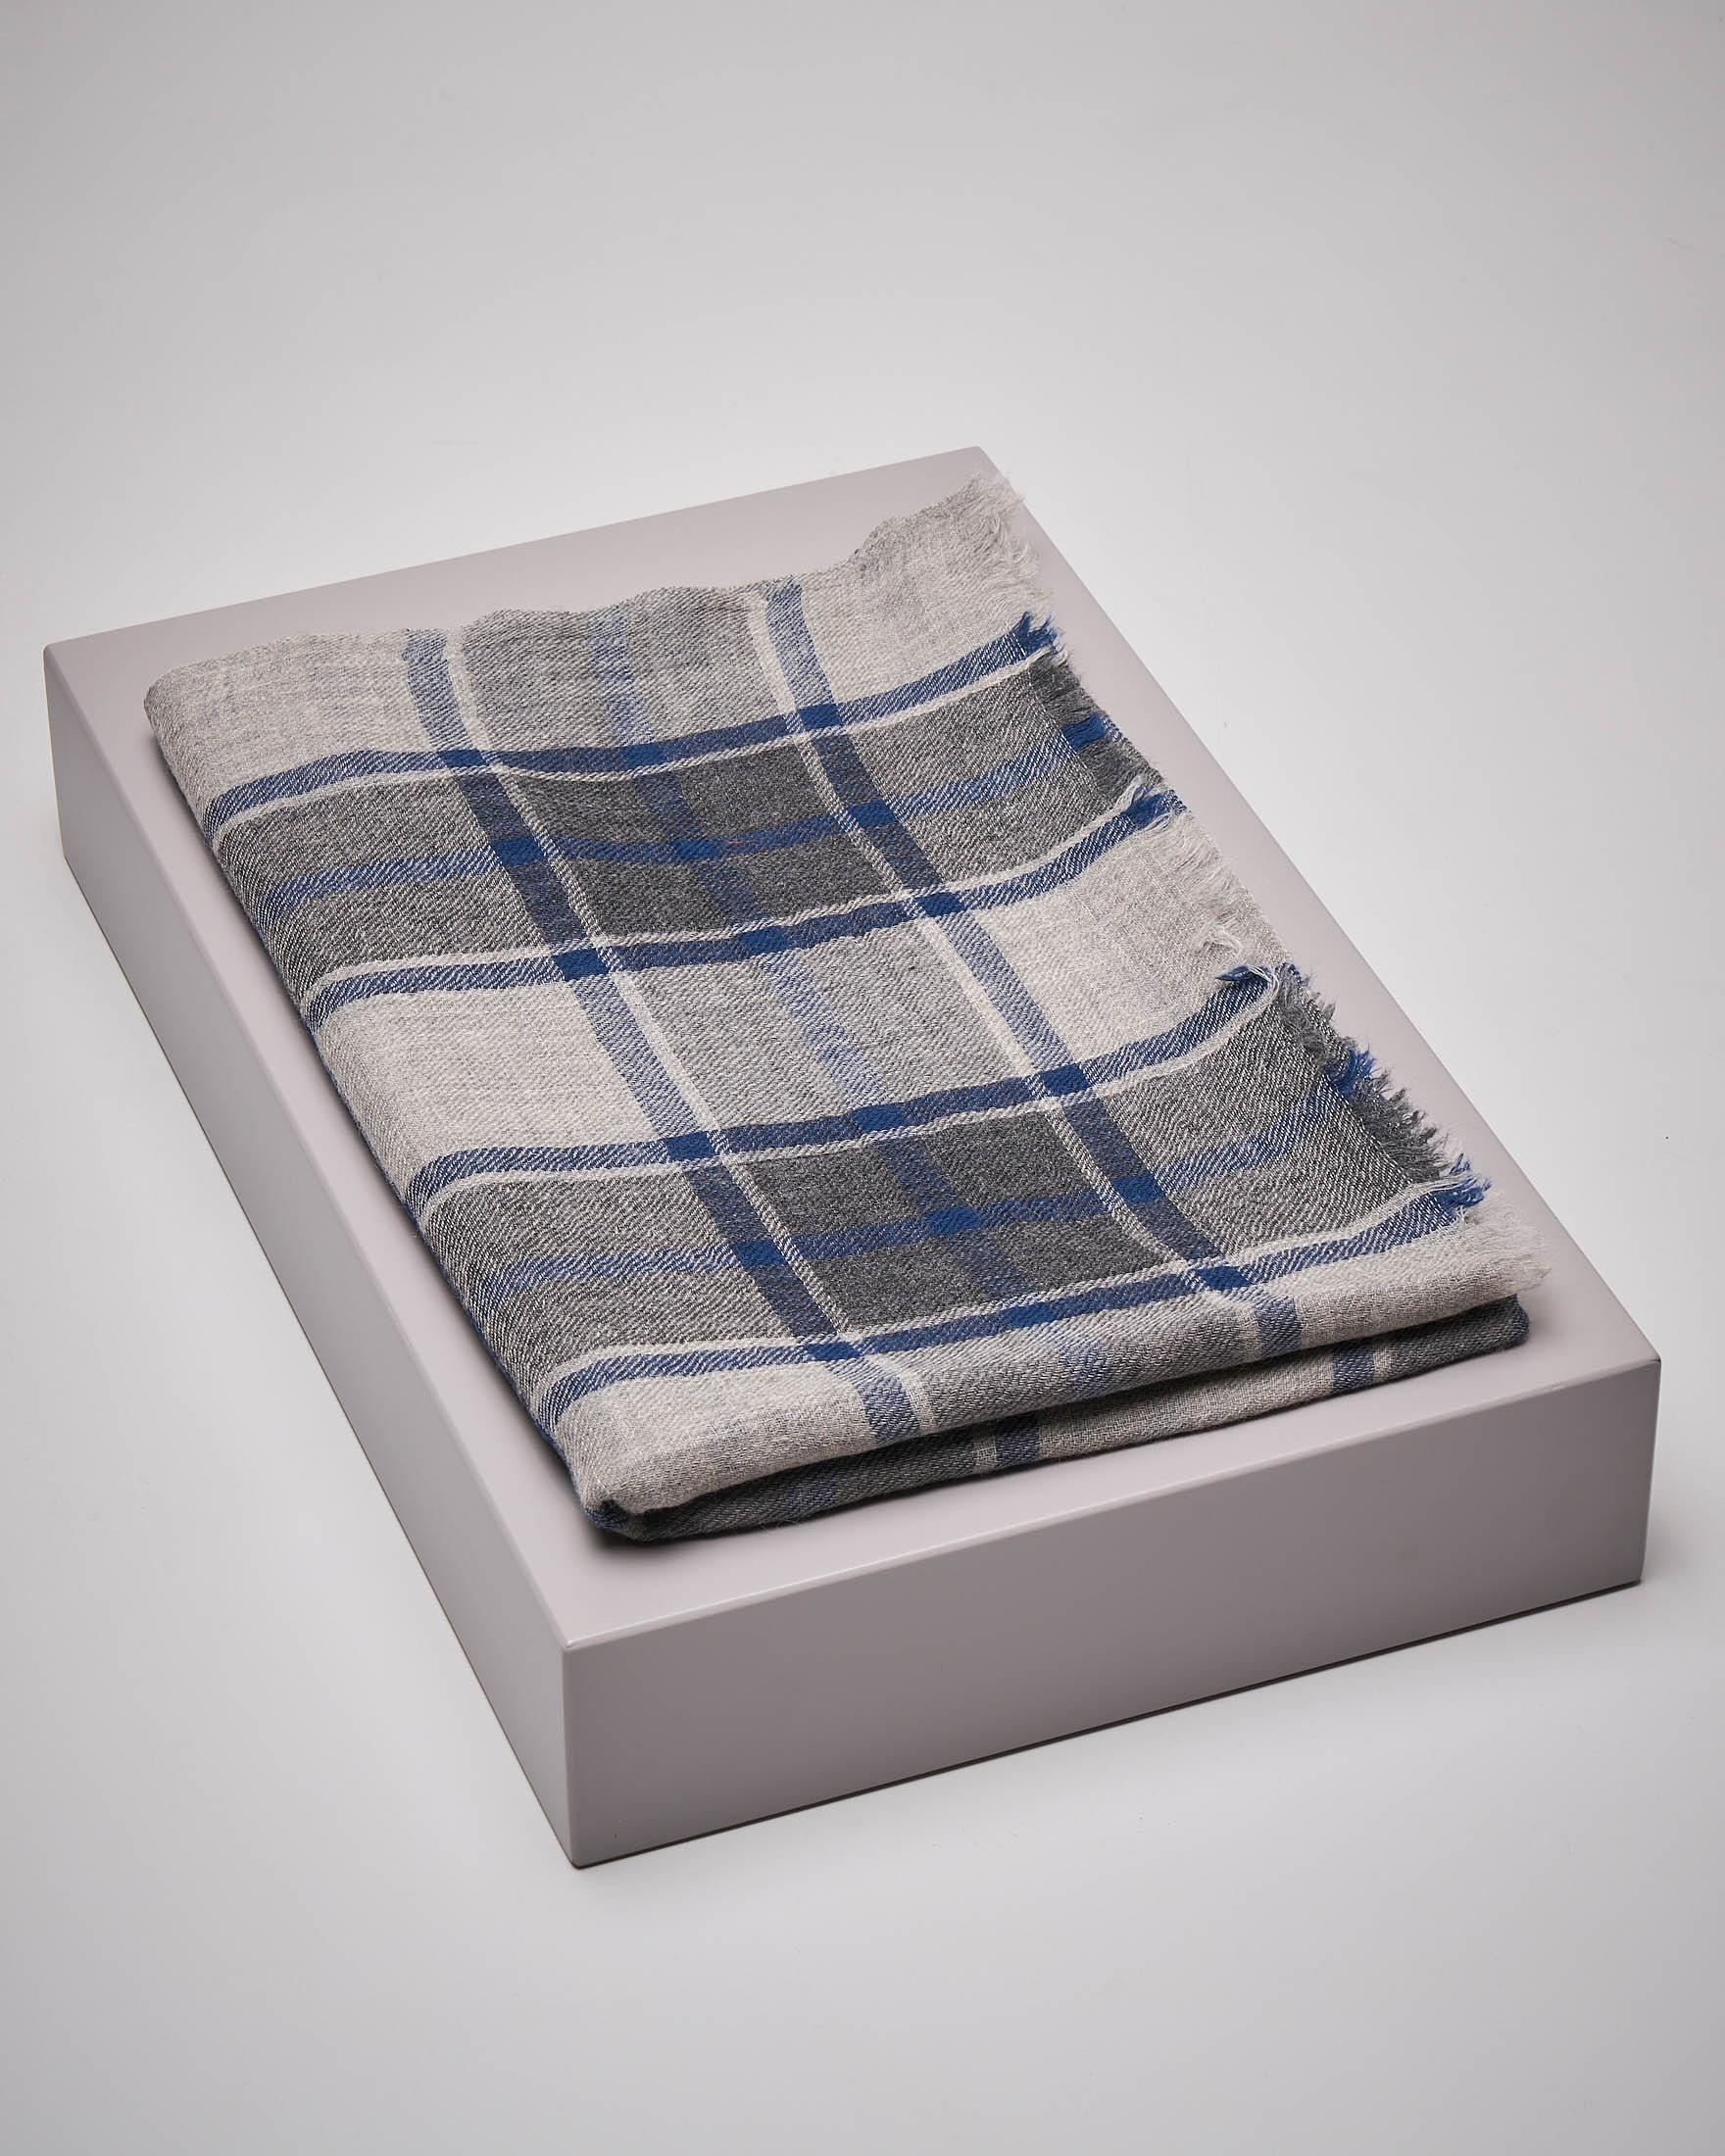 Sciarpa a quadri in lana